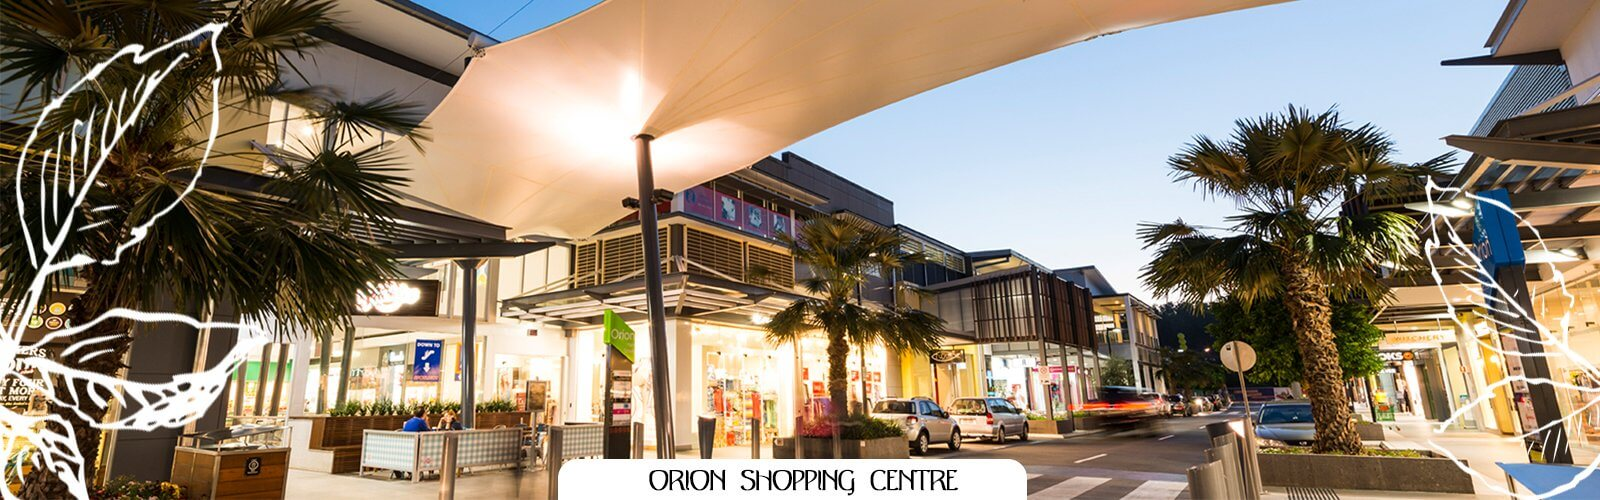 Orion shopping centre